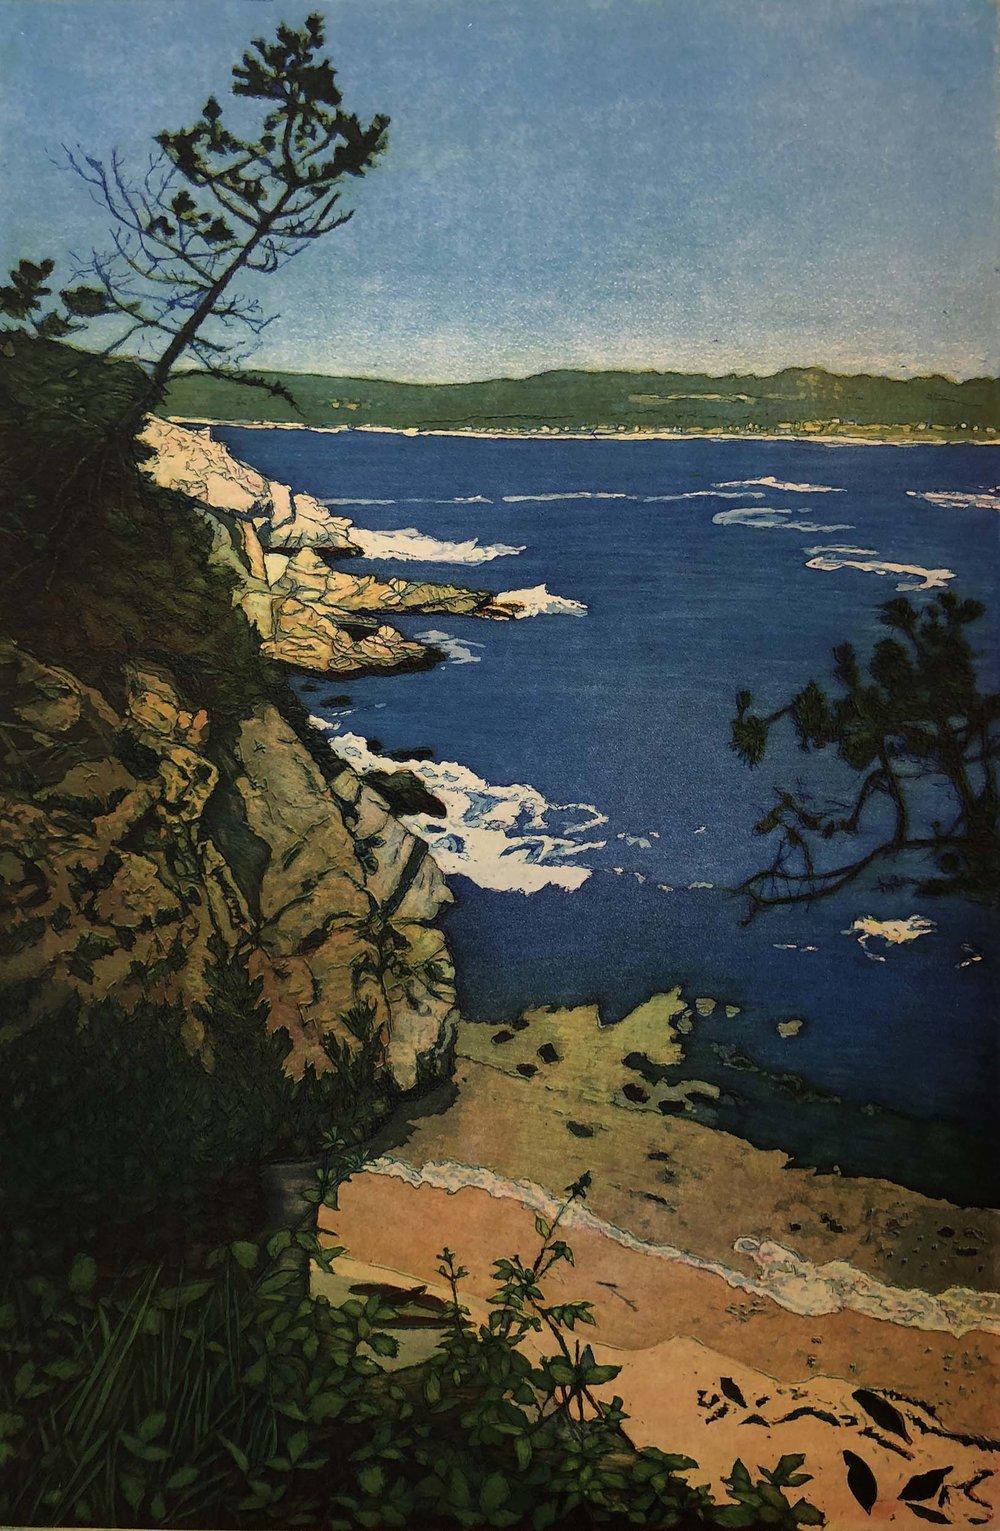 Landmark VI: Cove at Pt. Lobos